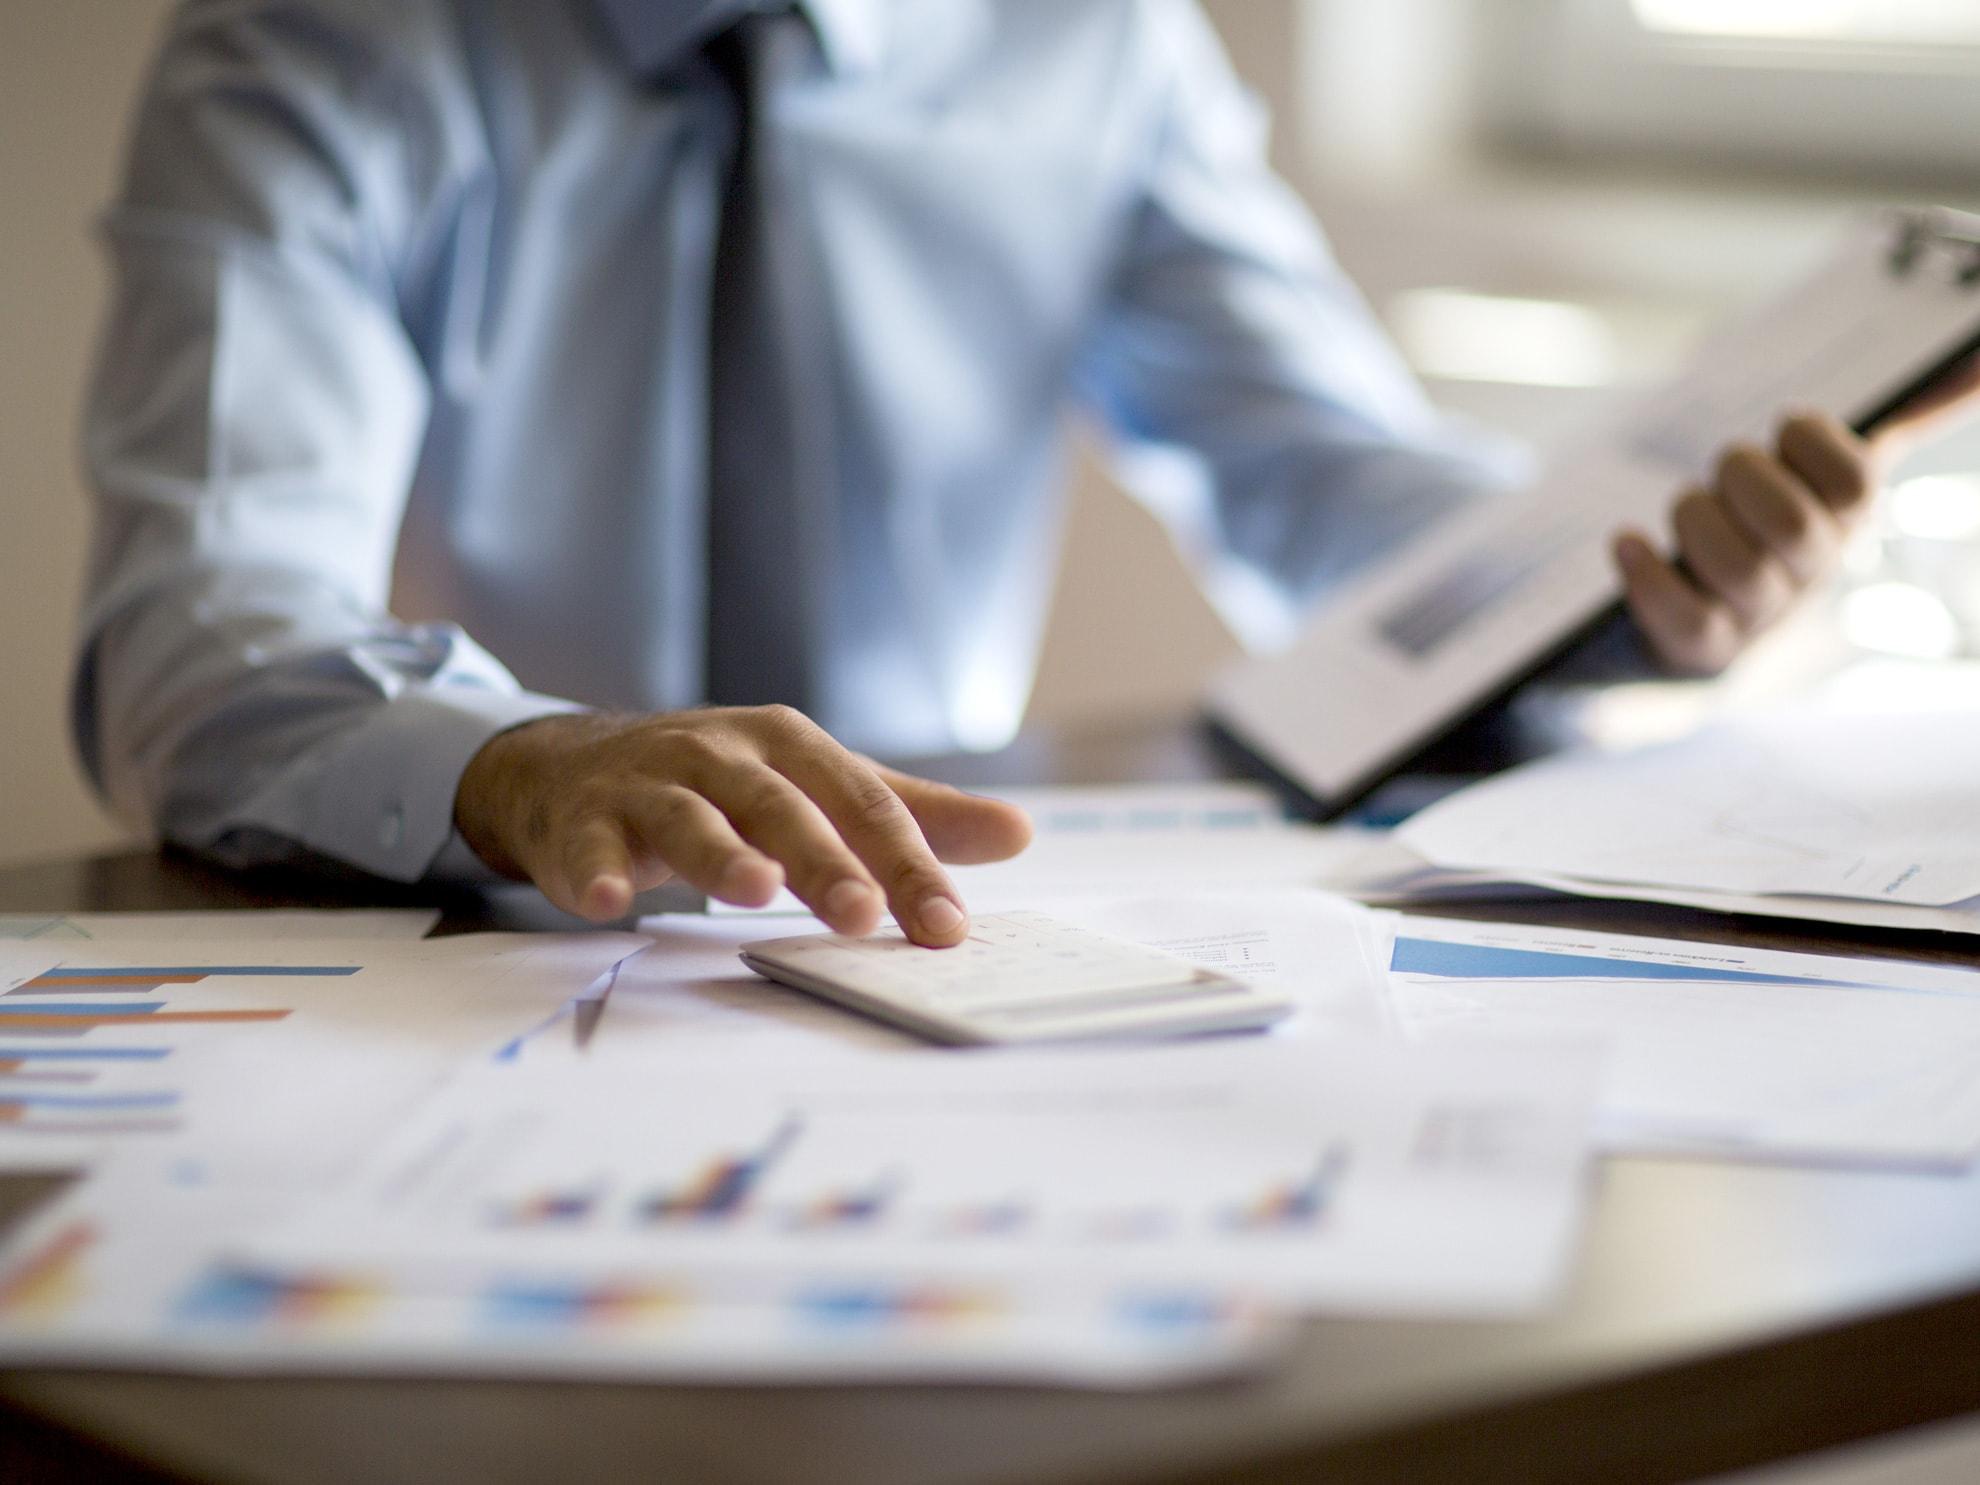 gestione-documenti-personale